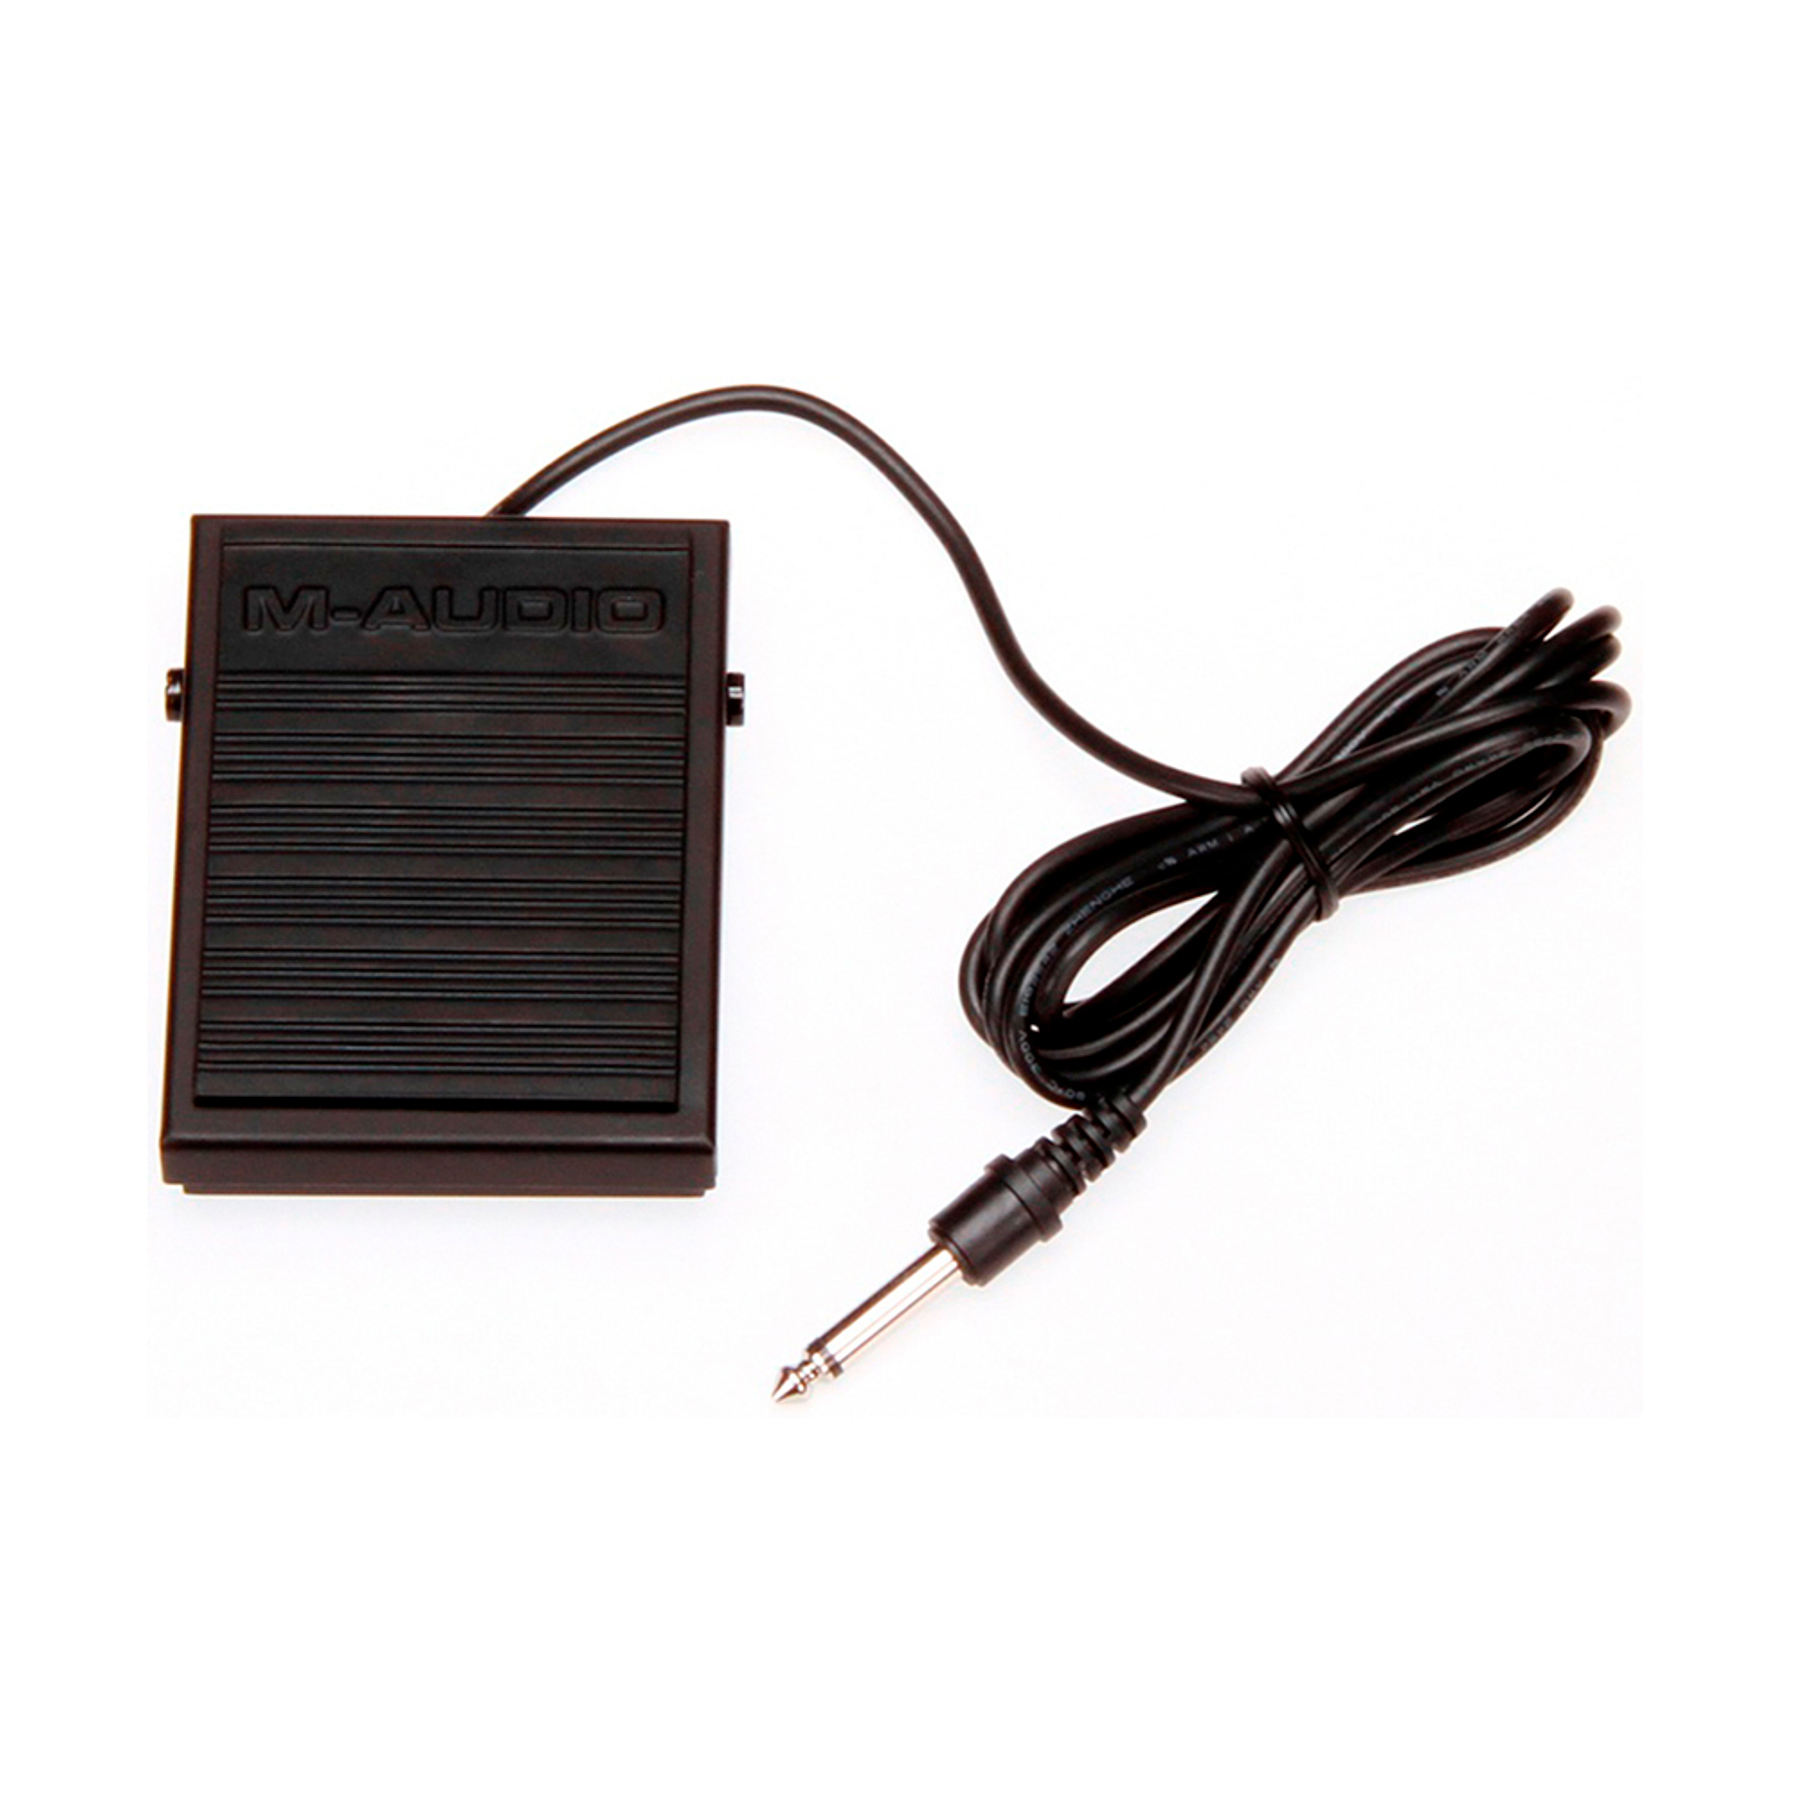 Pedal Sutain SP1 M-Audio